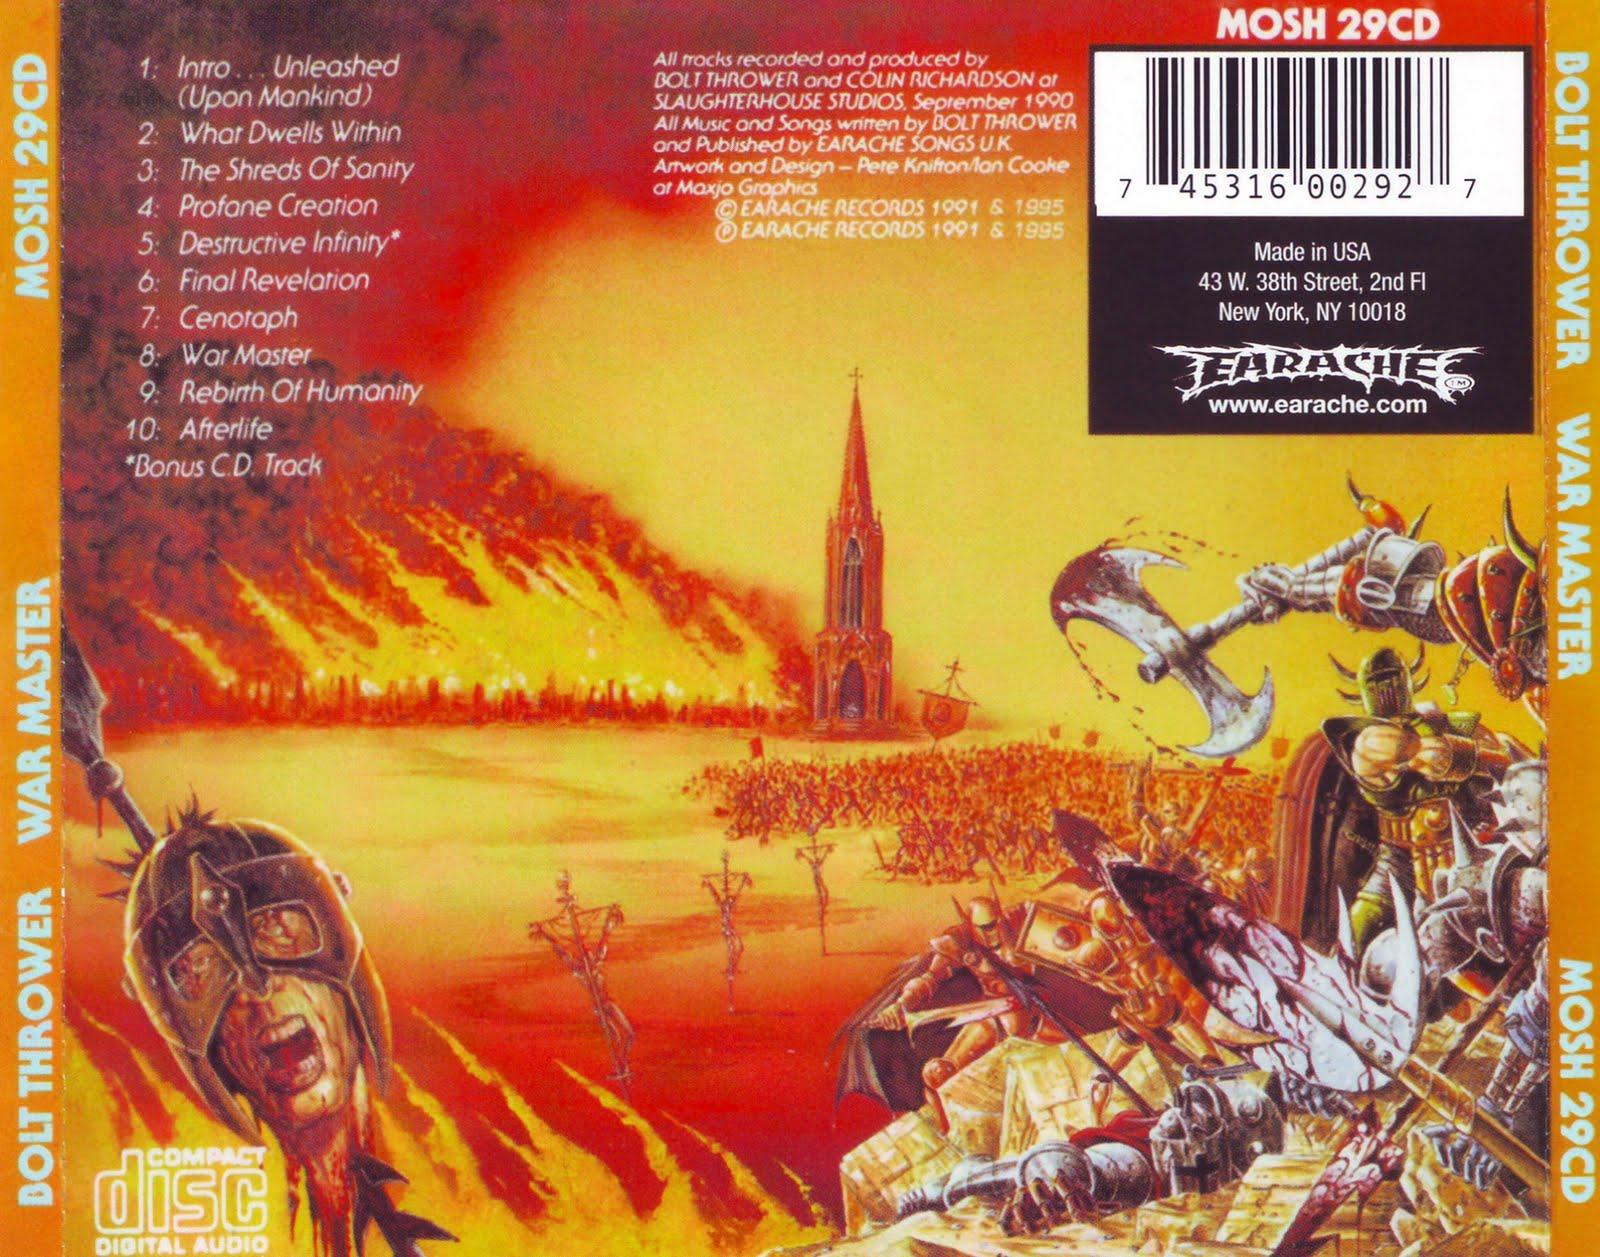 THE ARRIVAL: Bolt Thrower - War Master [1991]